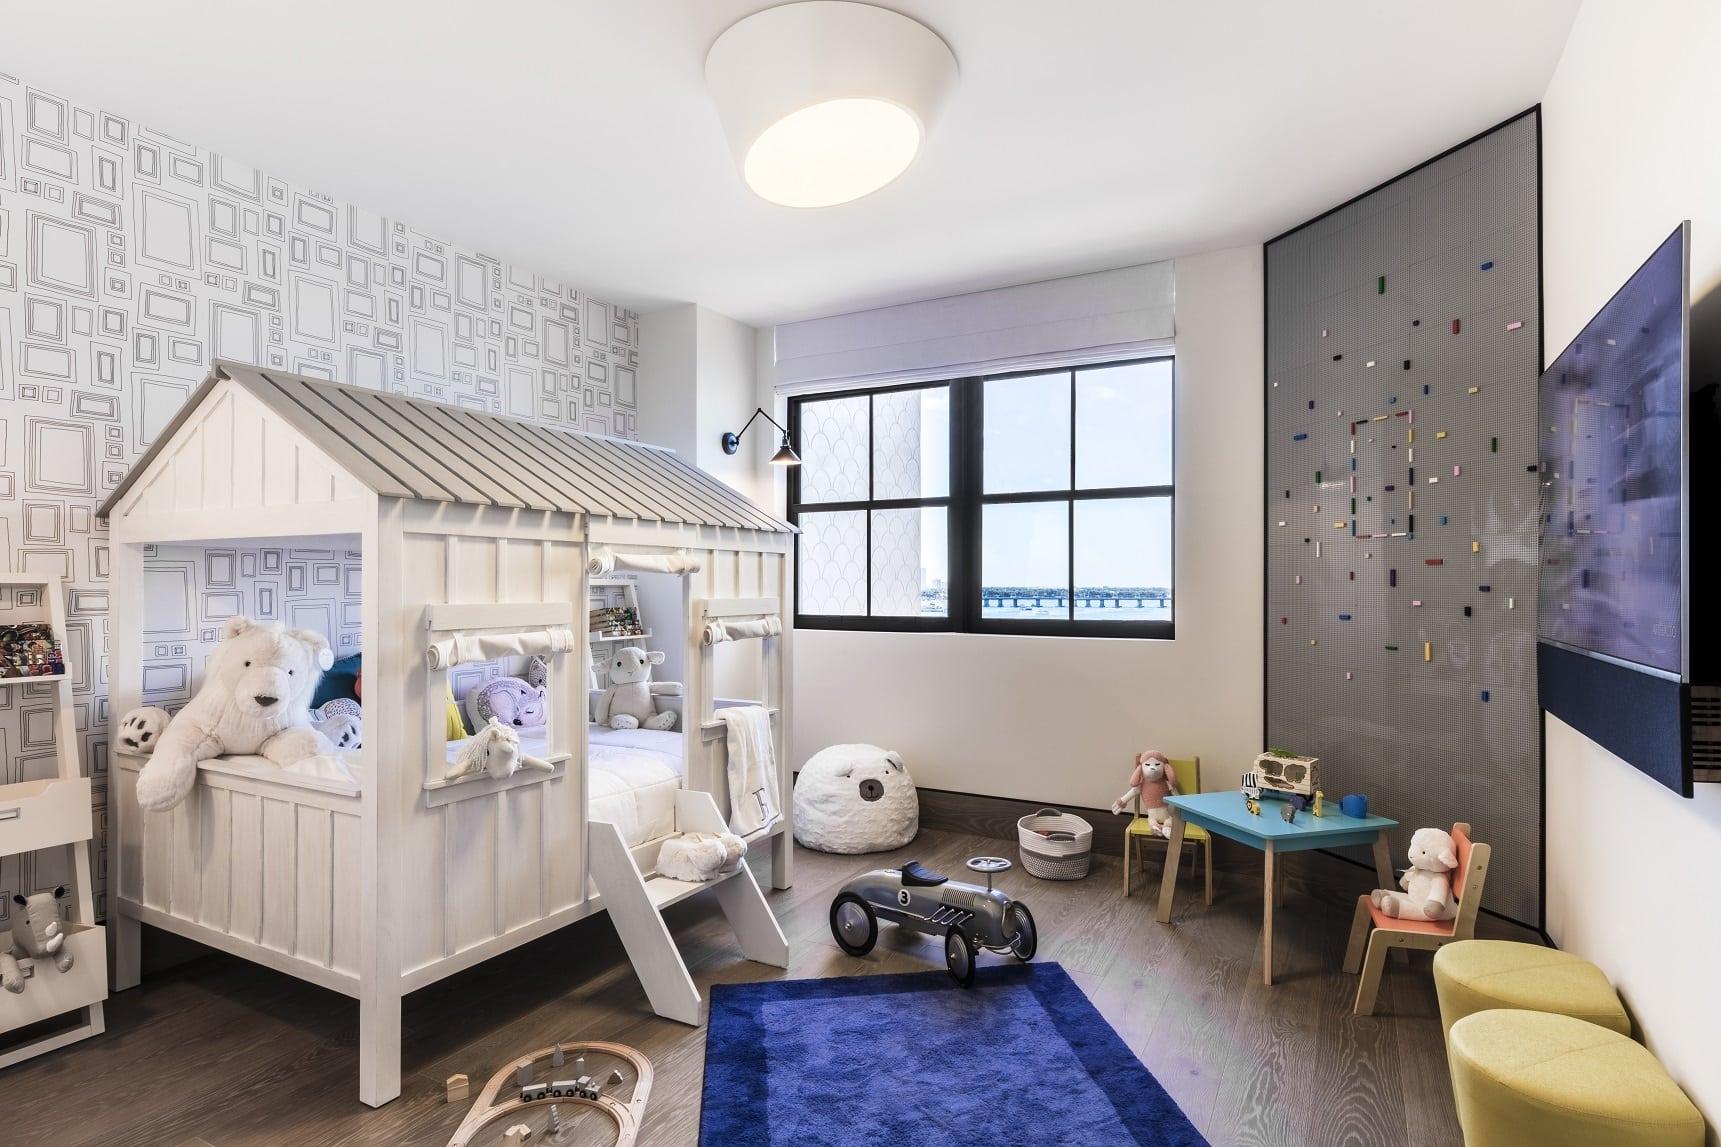 Kids room designed by Antrobus+Ramirez